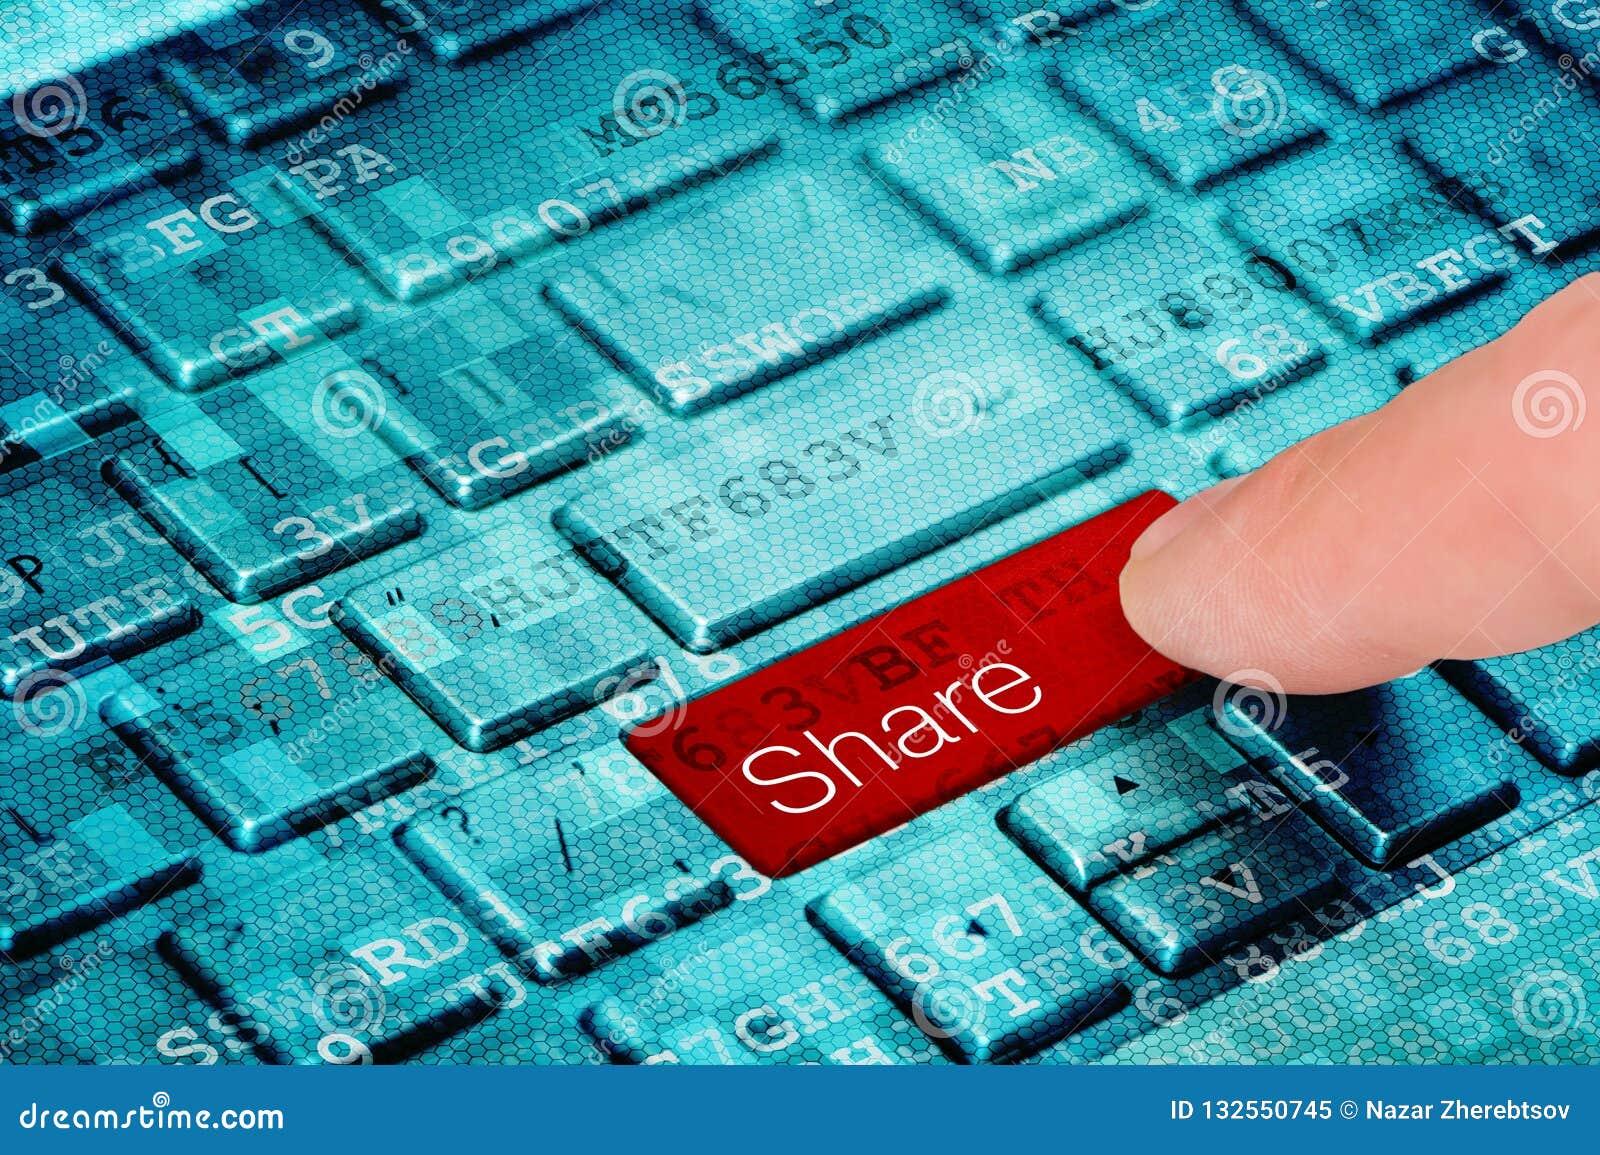 A finger press red Share button on blue digital laptop keyboard